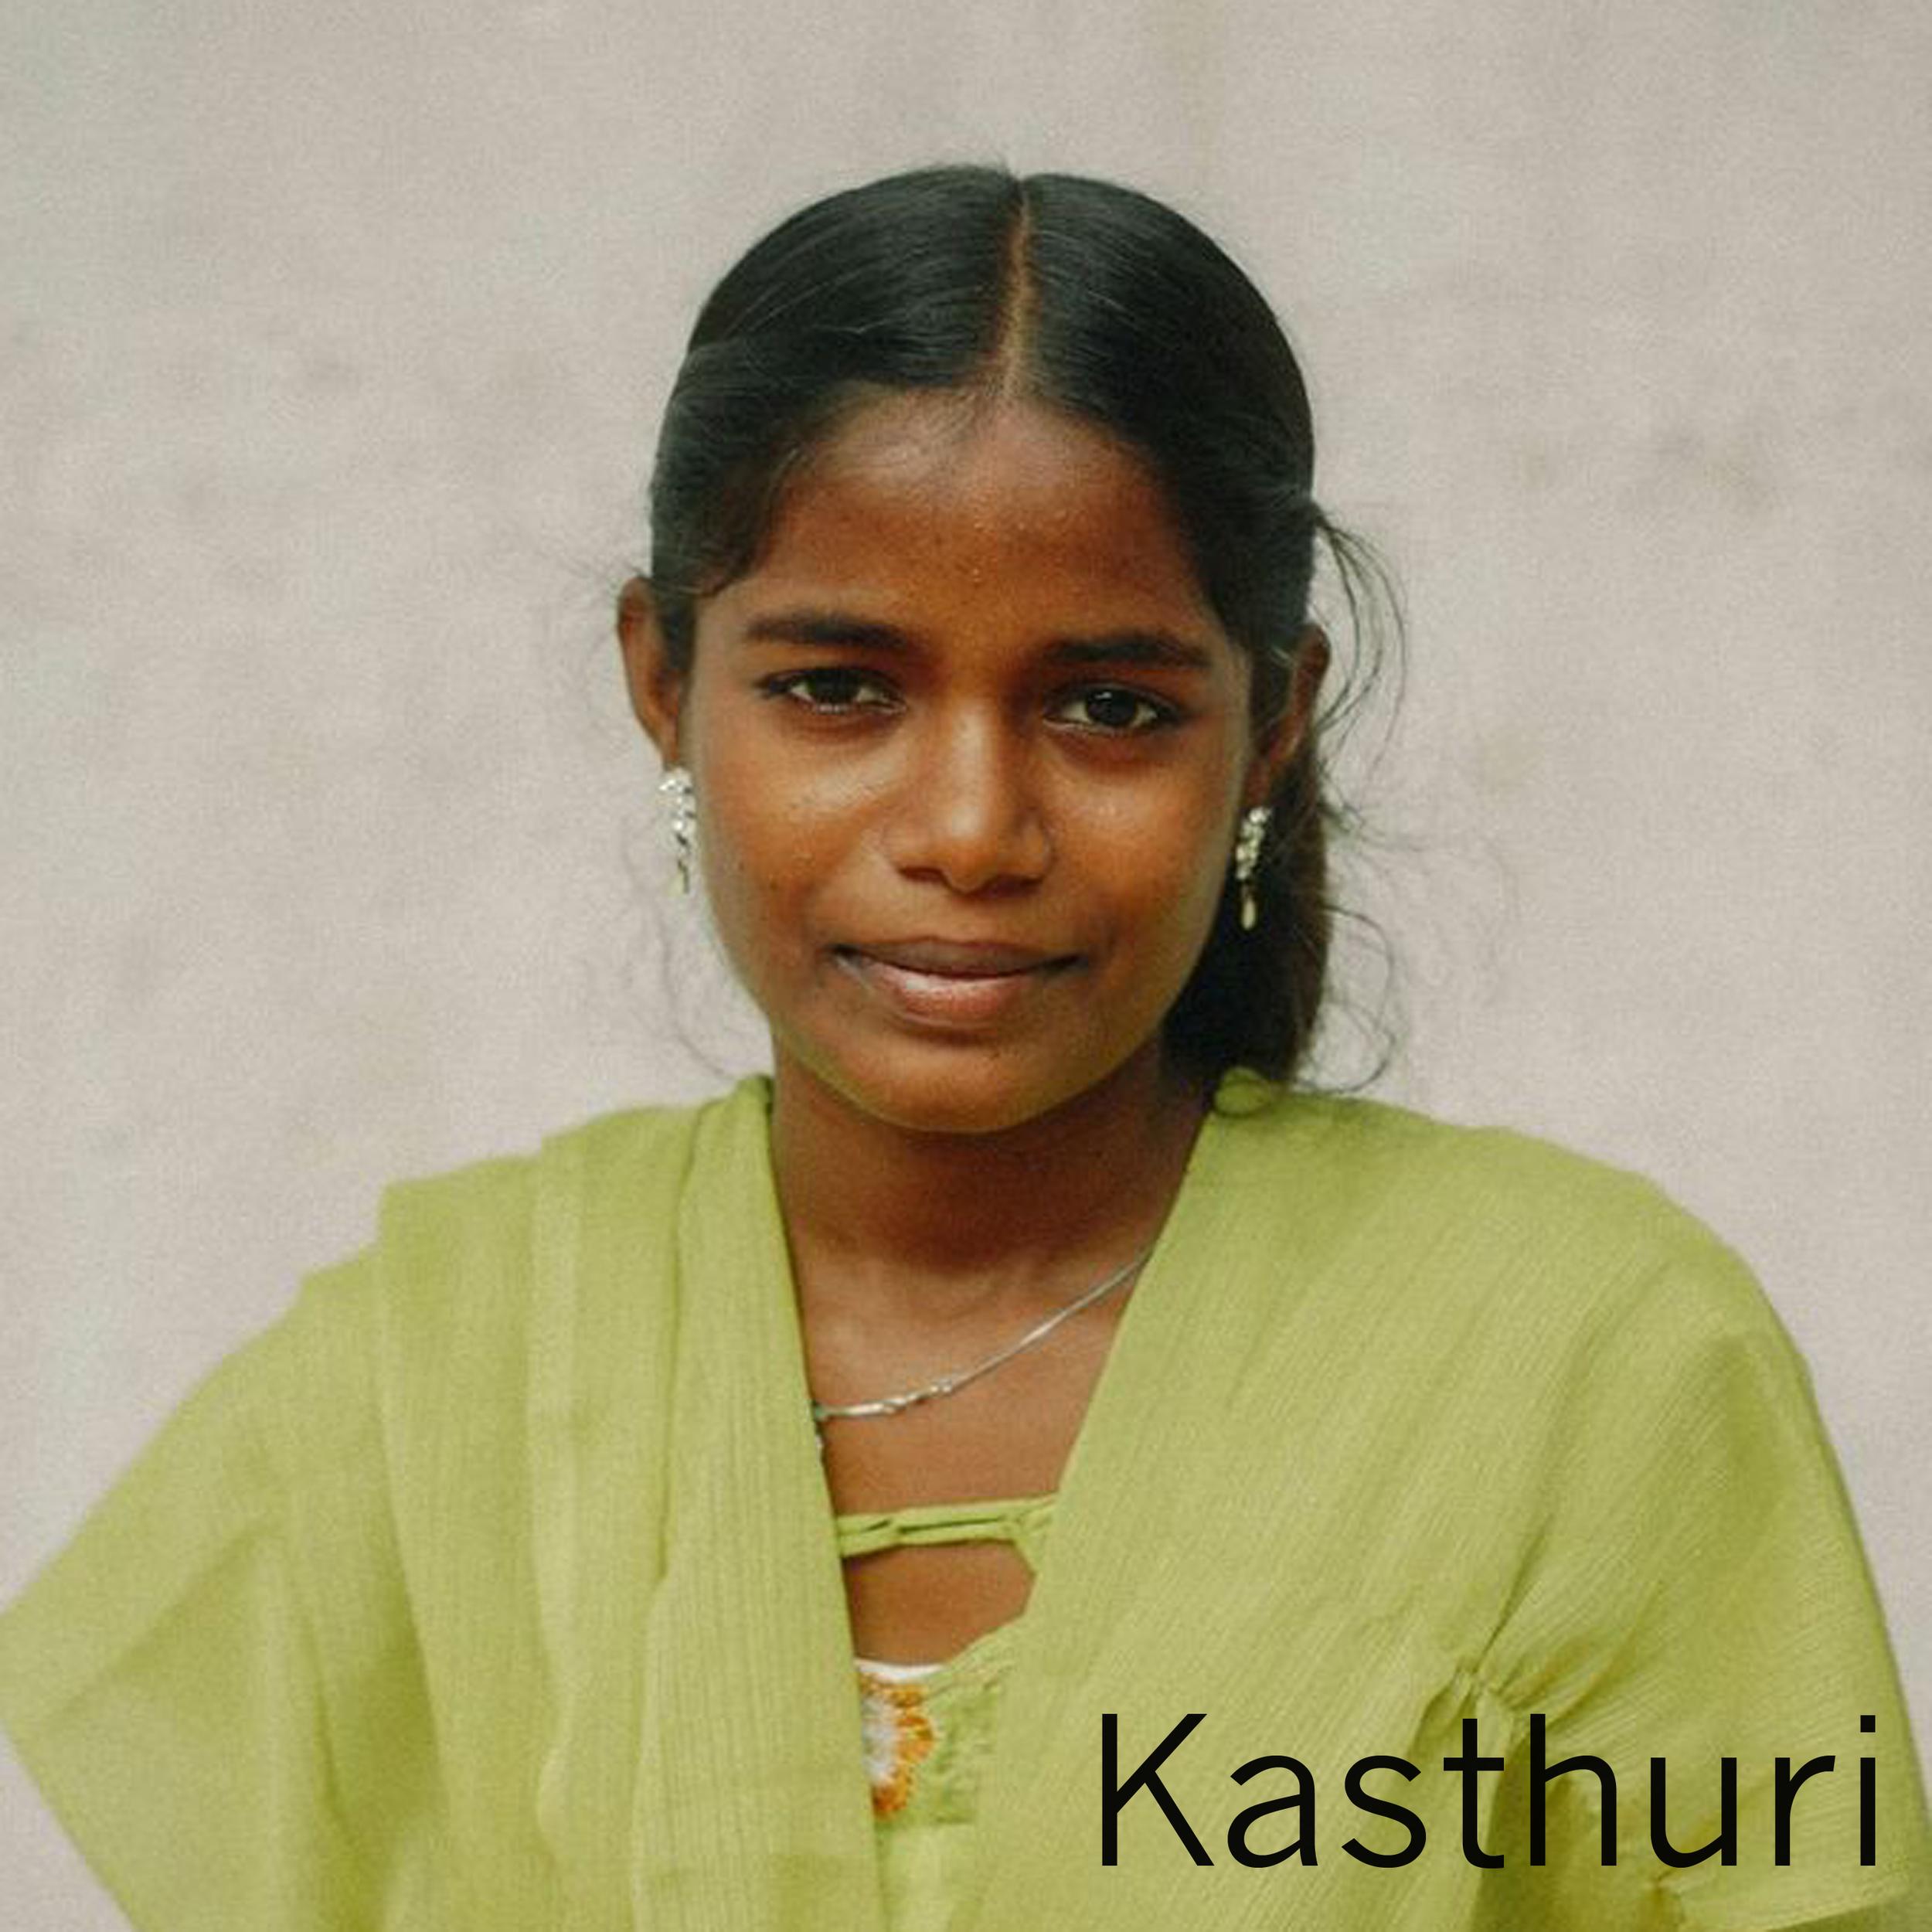 Kasthuri004_Name.jpg